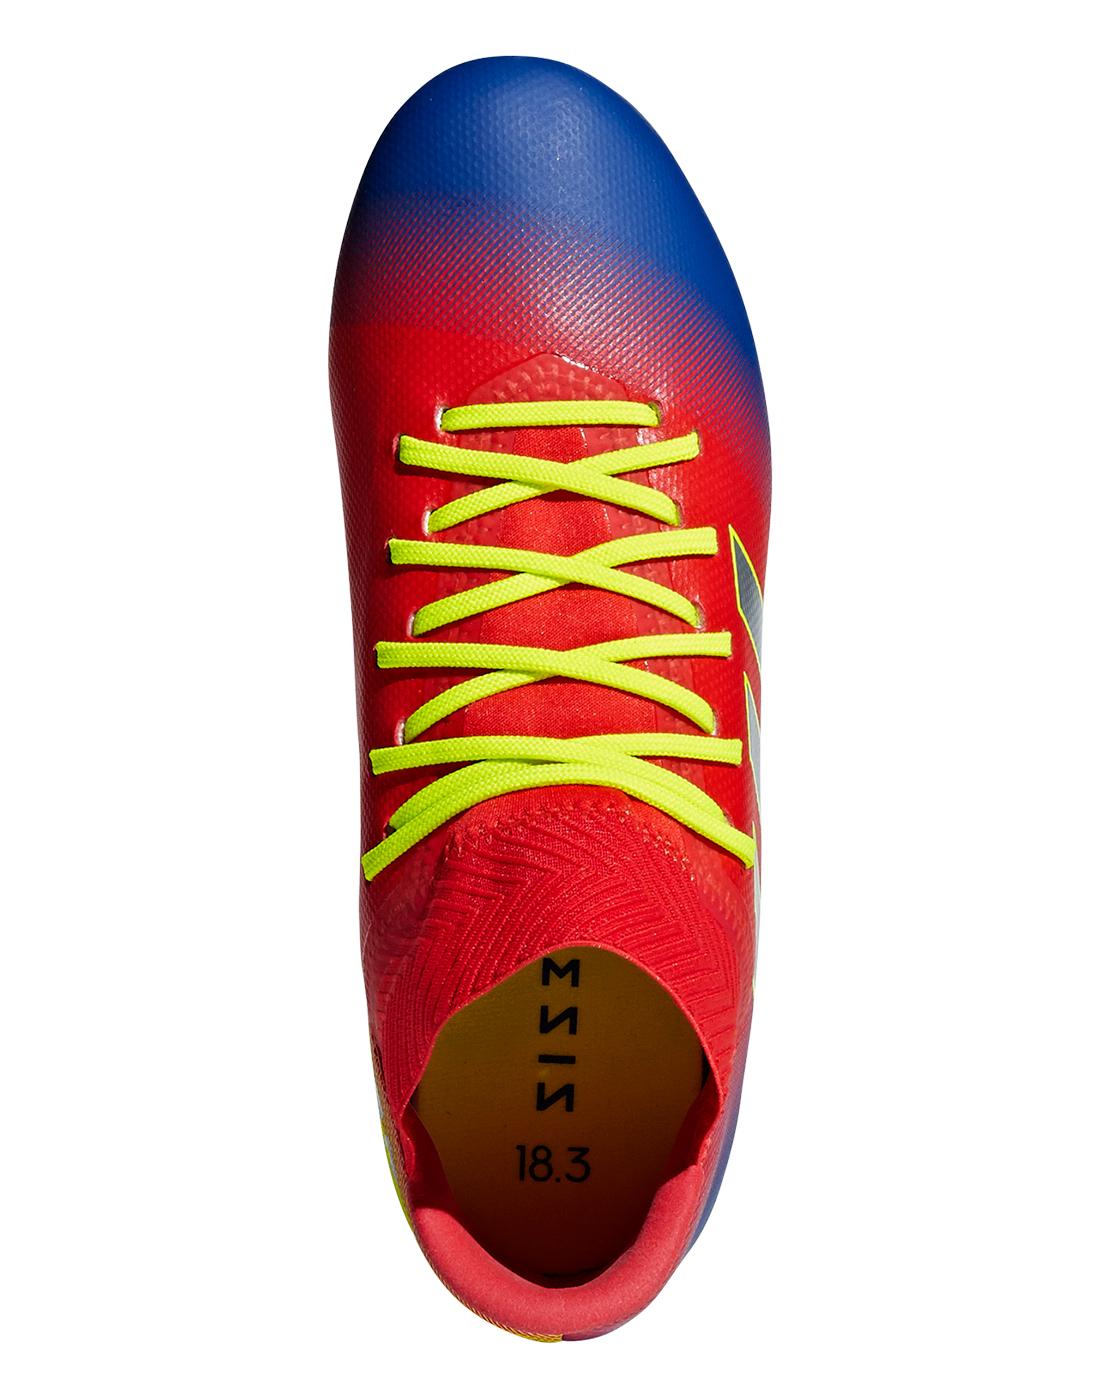 35f9cb7cc Kid's Blue & Red adidas Nemeziz 18.3 | Initiator Pack | Life Style ...